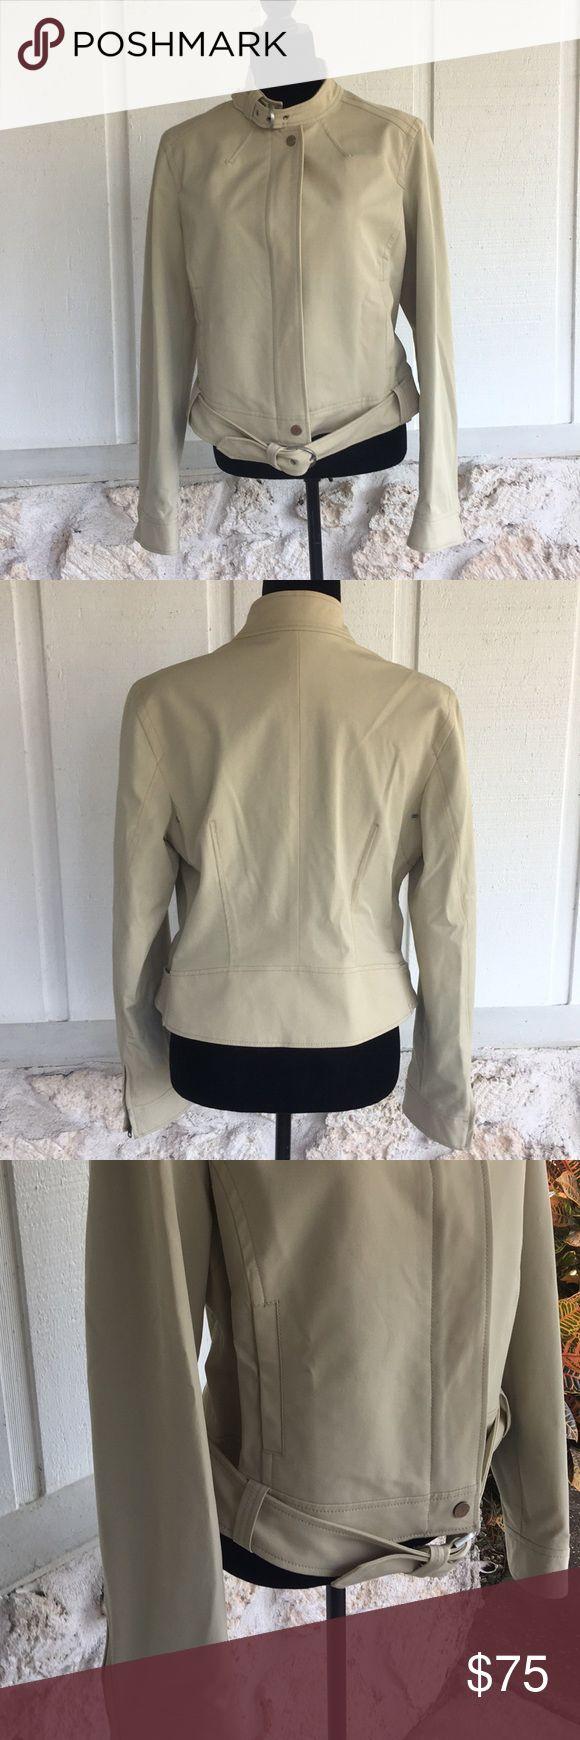 🆕Tommy Hilfiger Tan Moro jacket ✅I ship same or next day ✅Bundle for discount Tommy Hilfiger Jackets & Coats